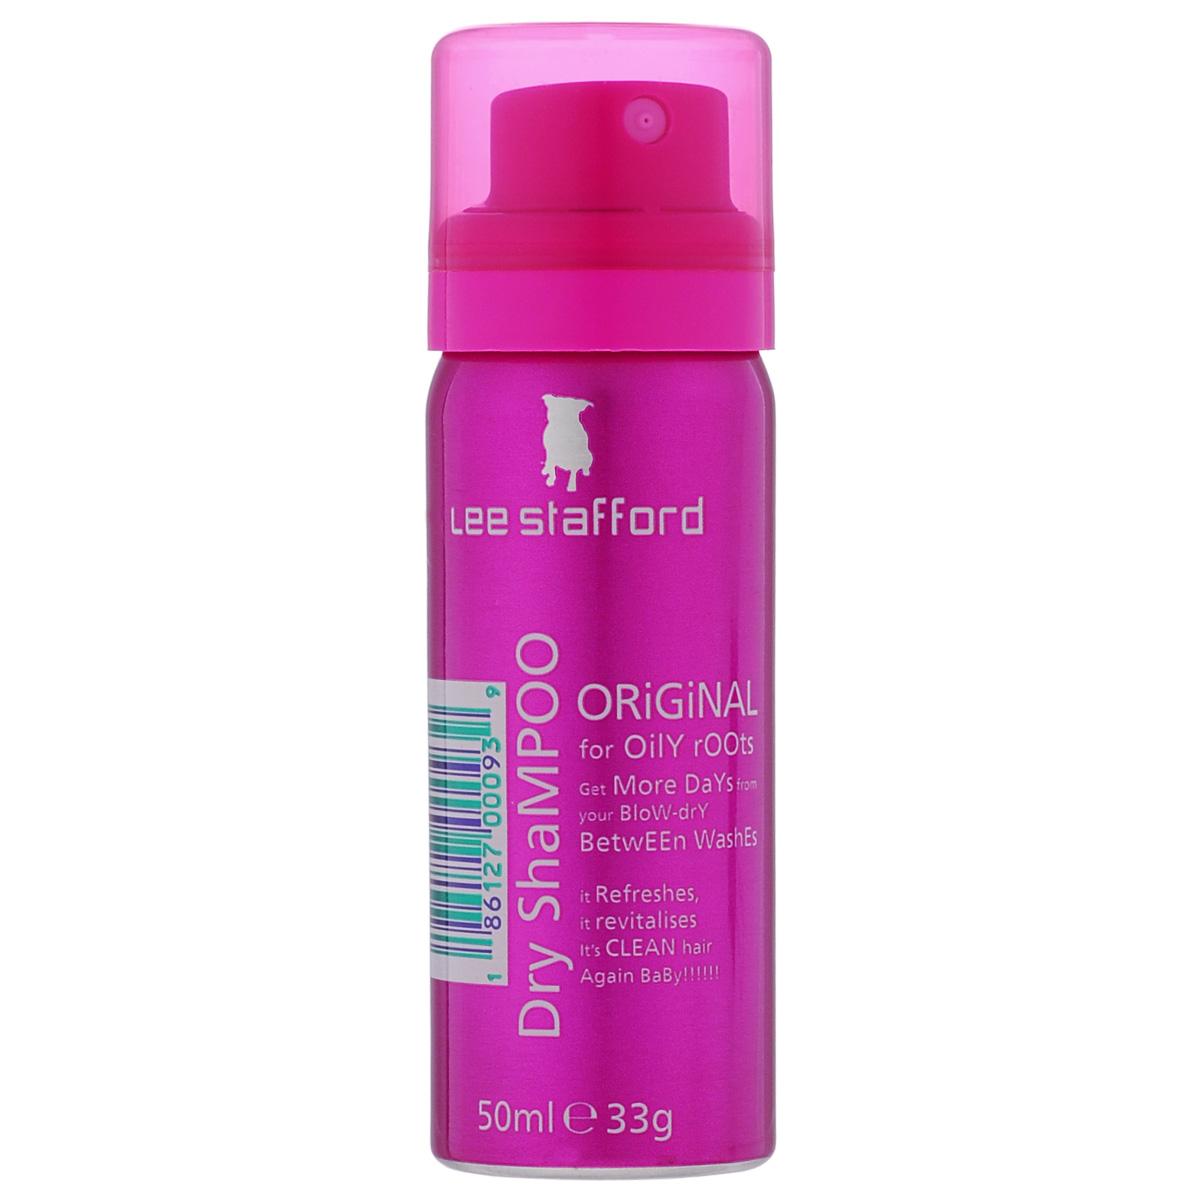 Lee StaffordСухой шампунь для волос